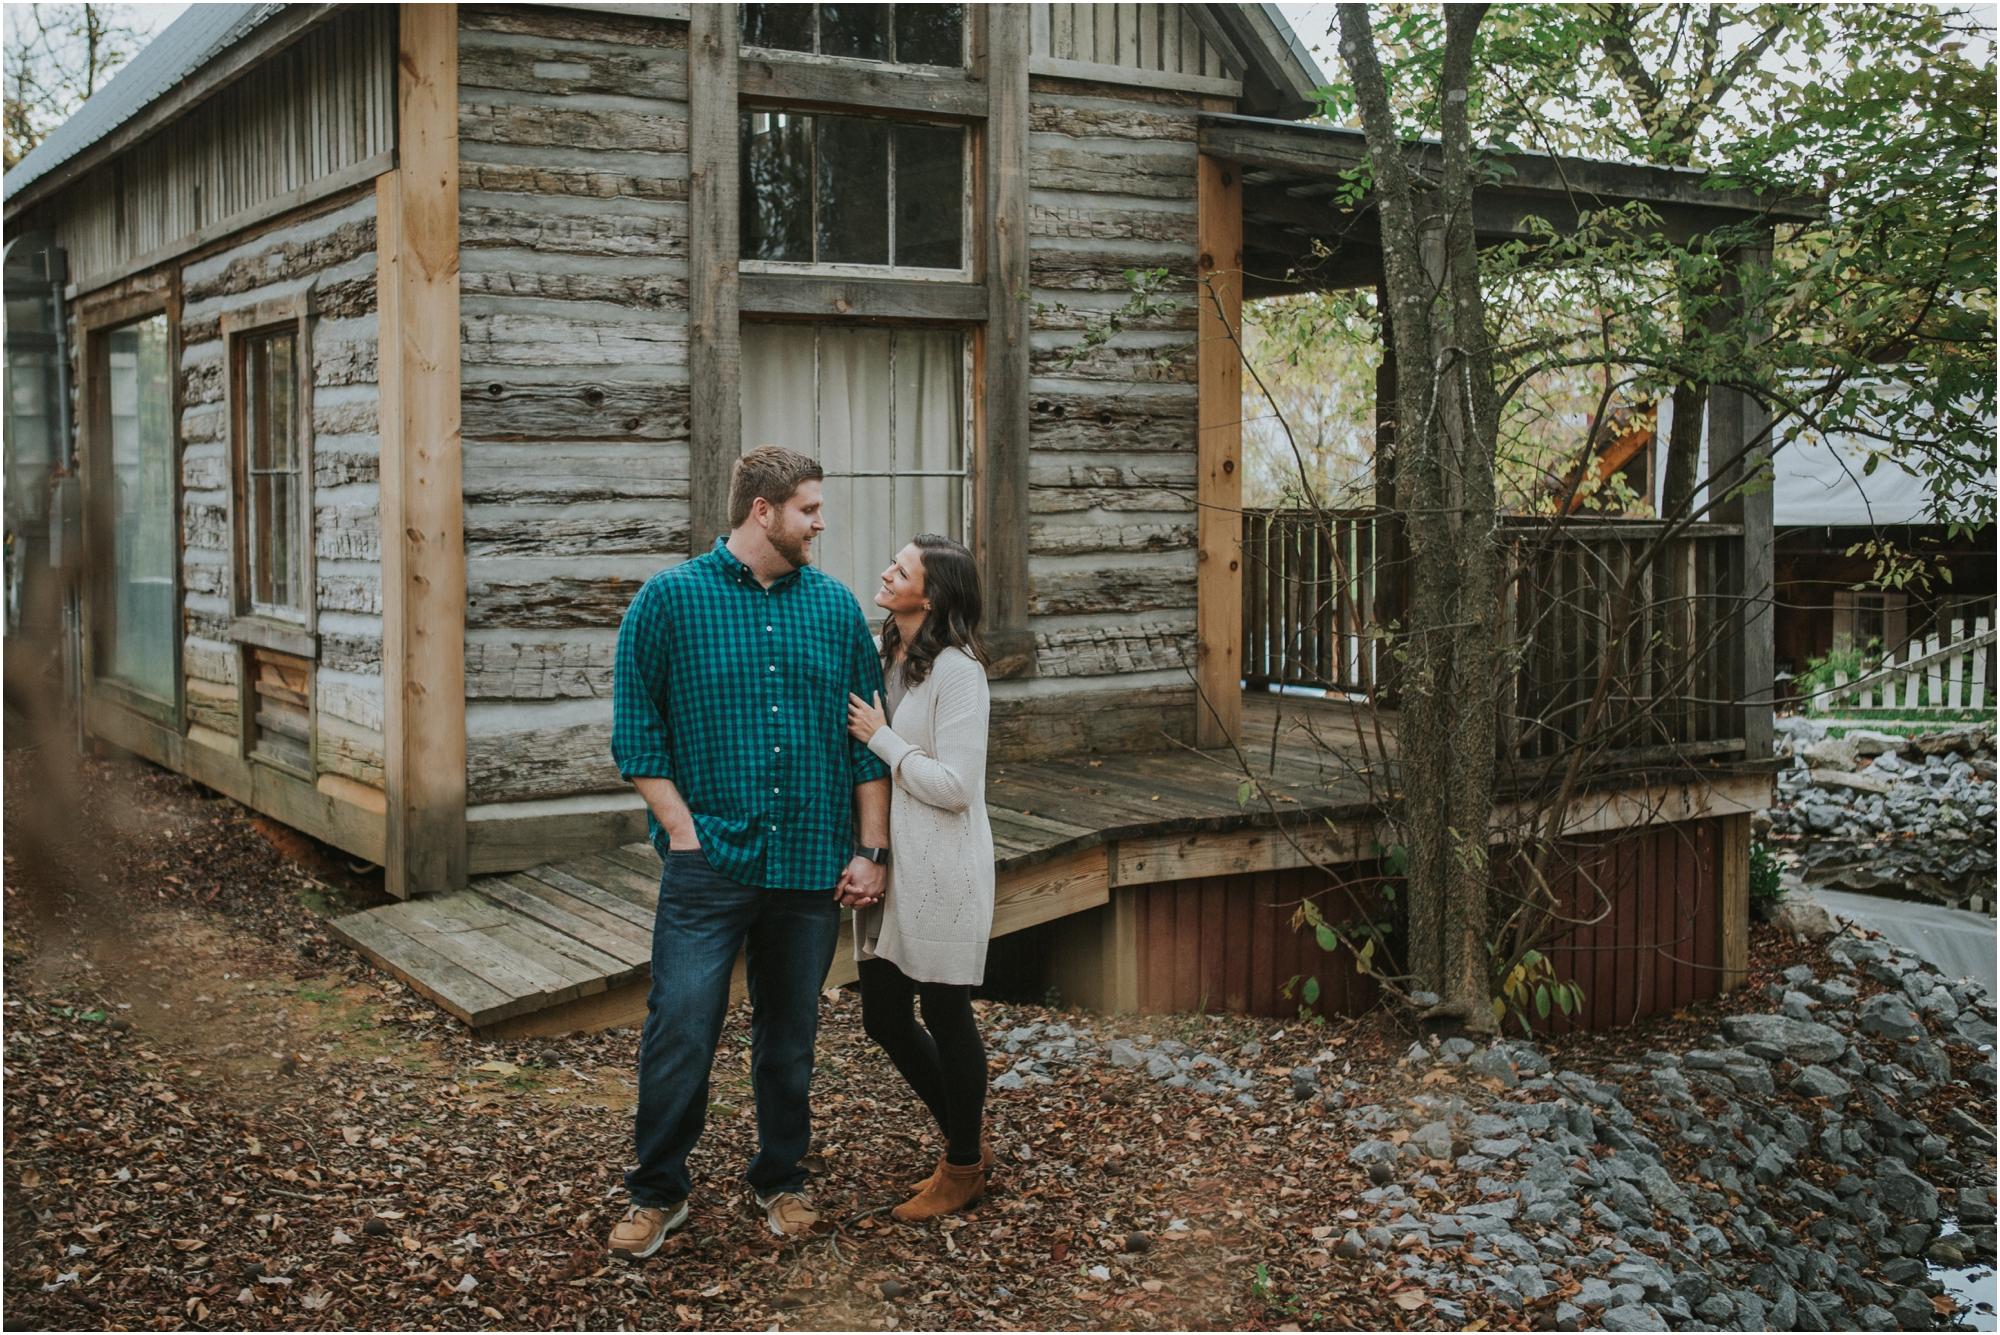 katy-sergent-millstone-limestone-tn-rustic-fall-engagement-session-adventurous-outdoors-intimate-elopement-wedding-northeast-johnson-city-photographer_0030.jpg